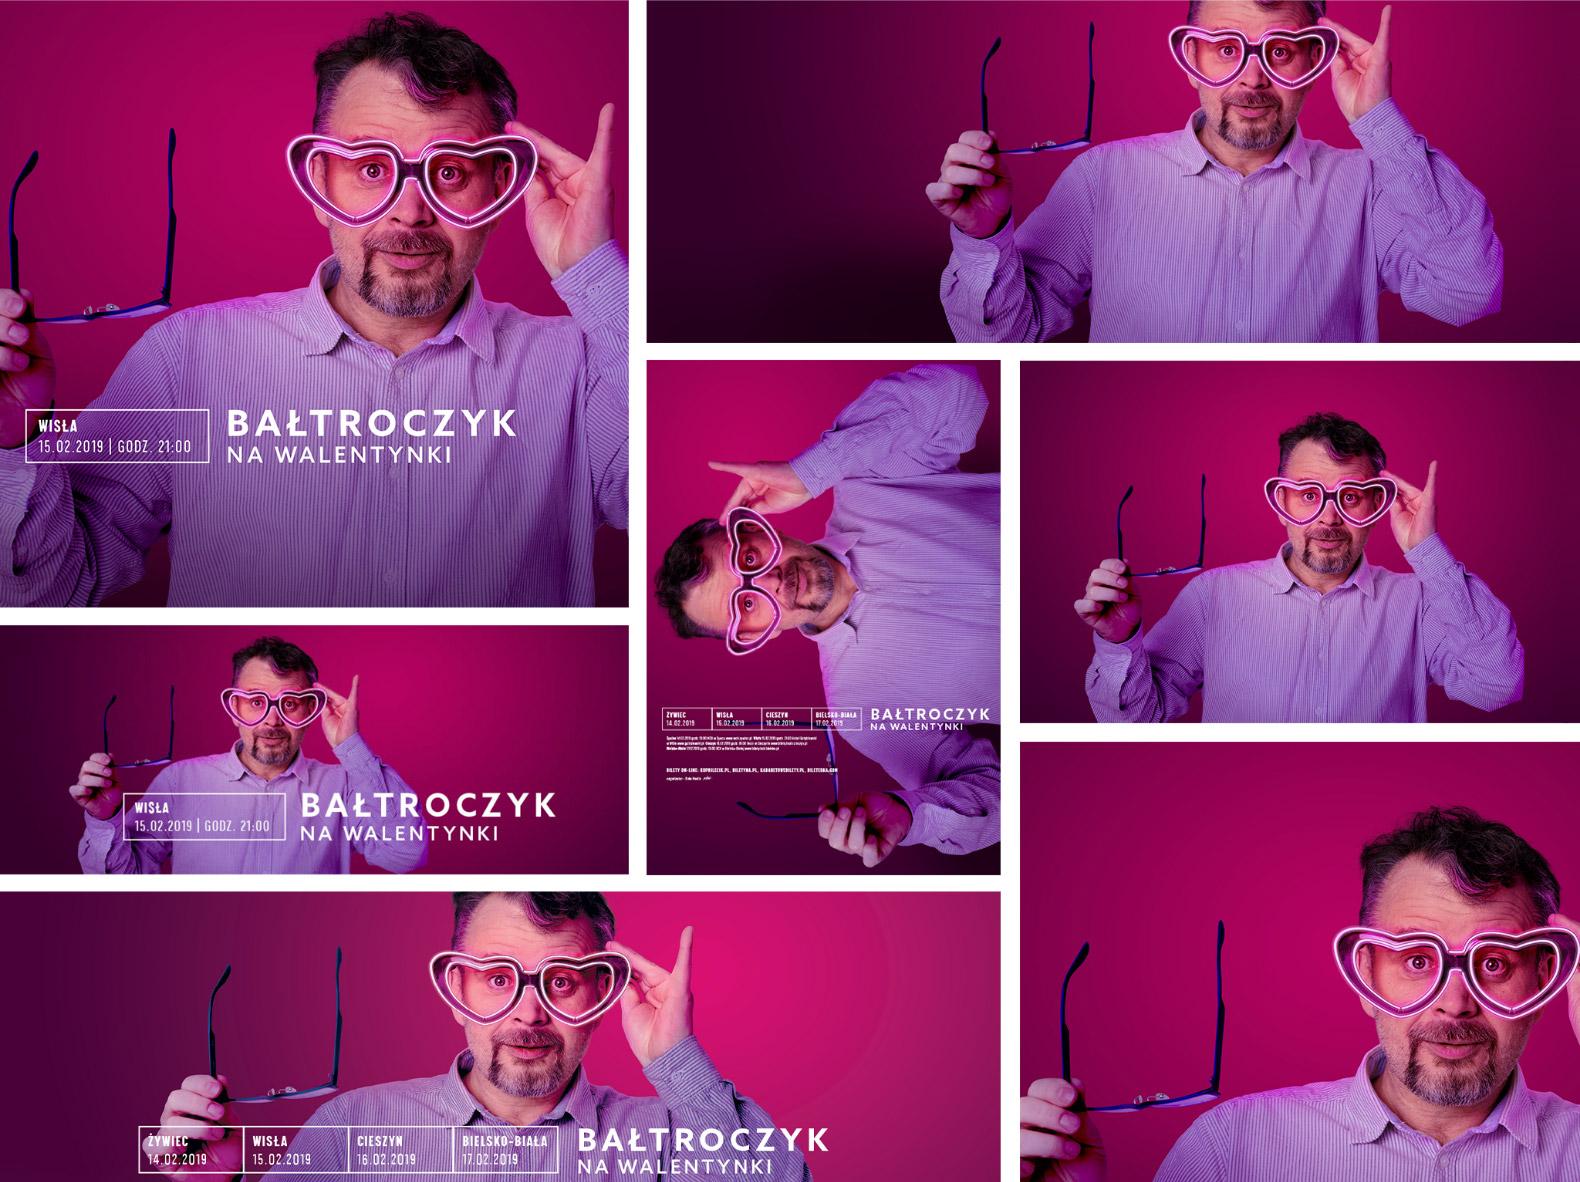 Reklama na Facebooku banery Bałtroczyk